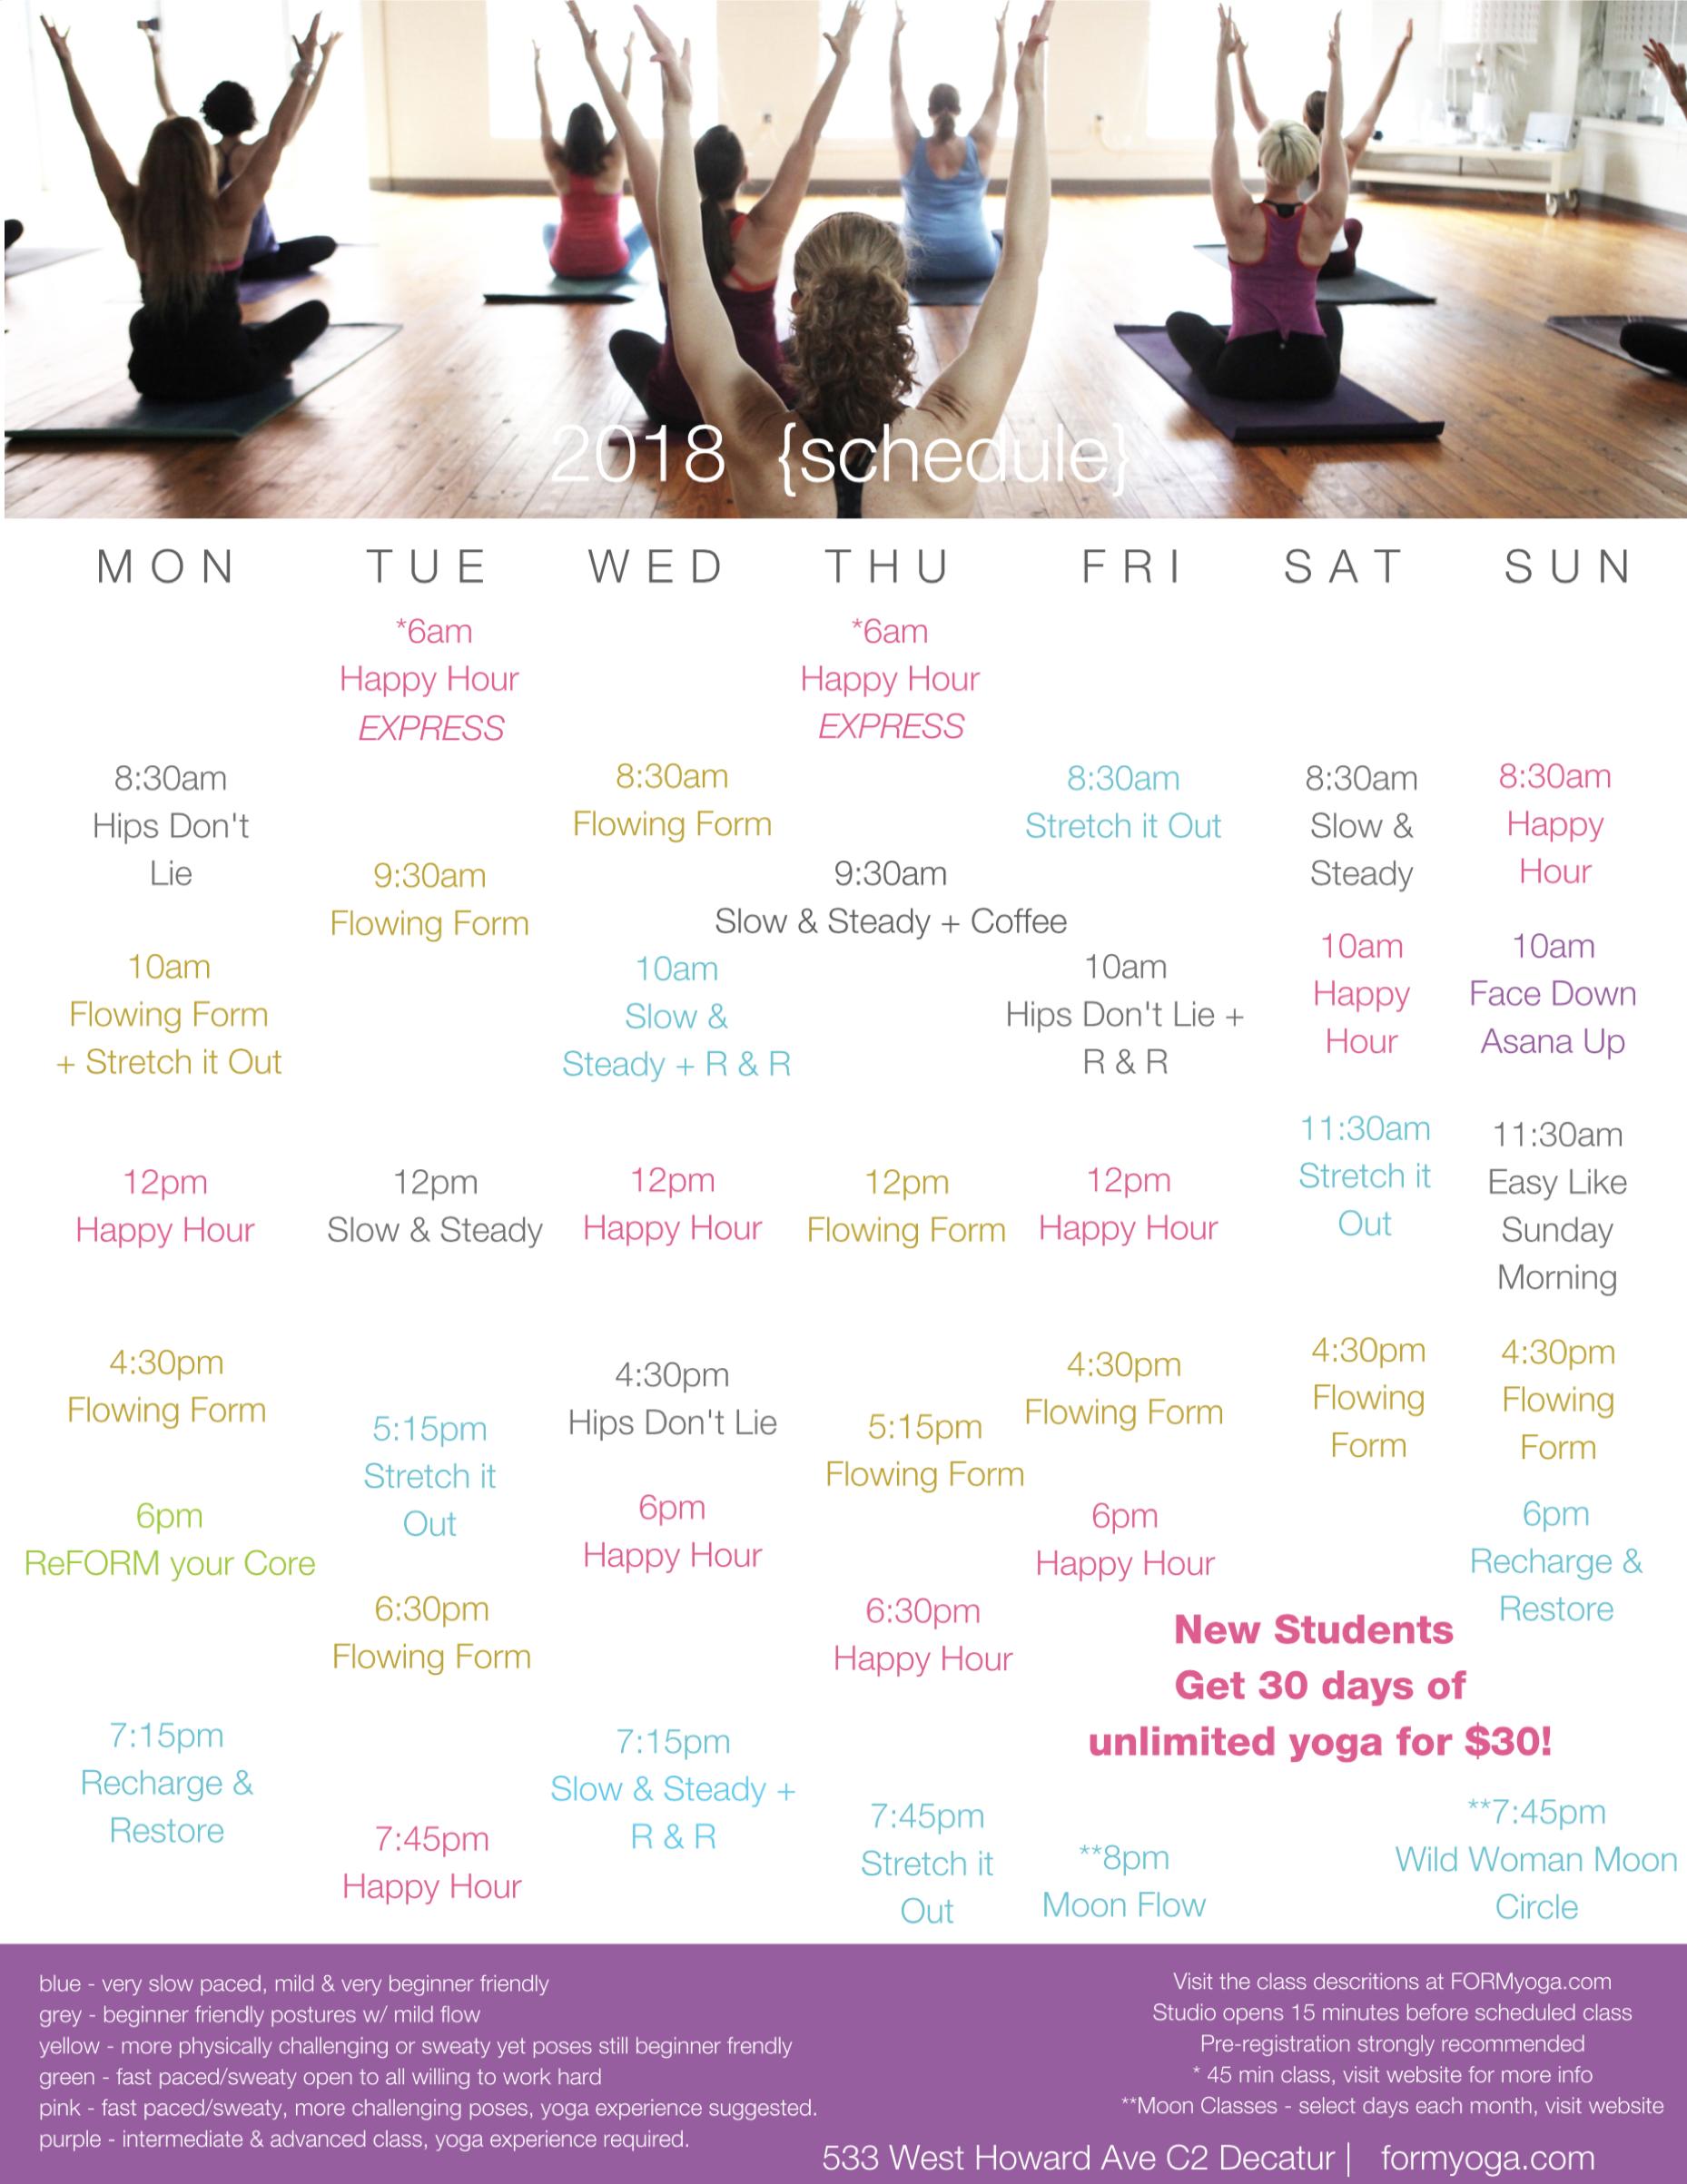 2018 FORM yoga Schedule